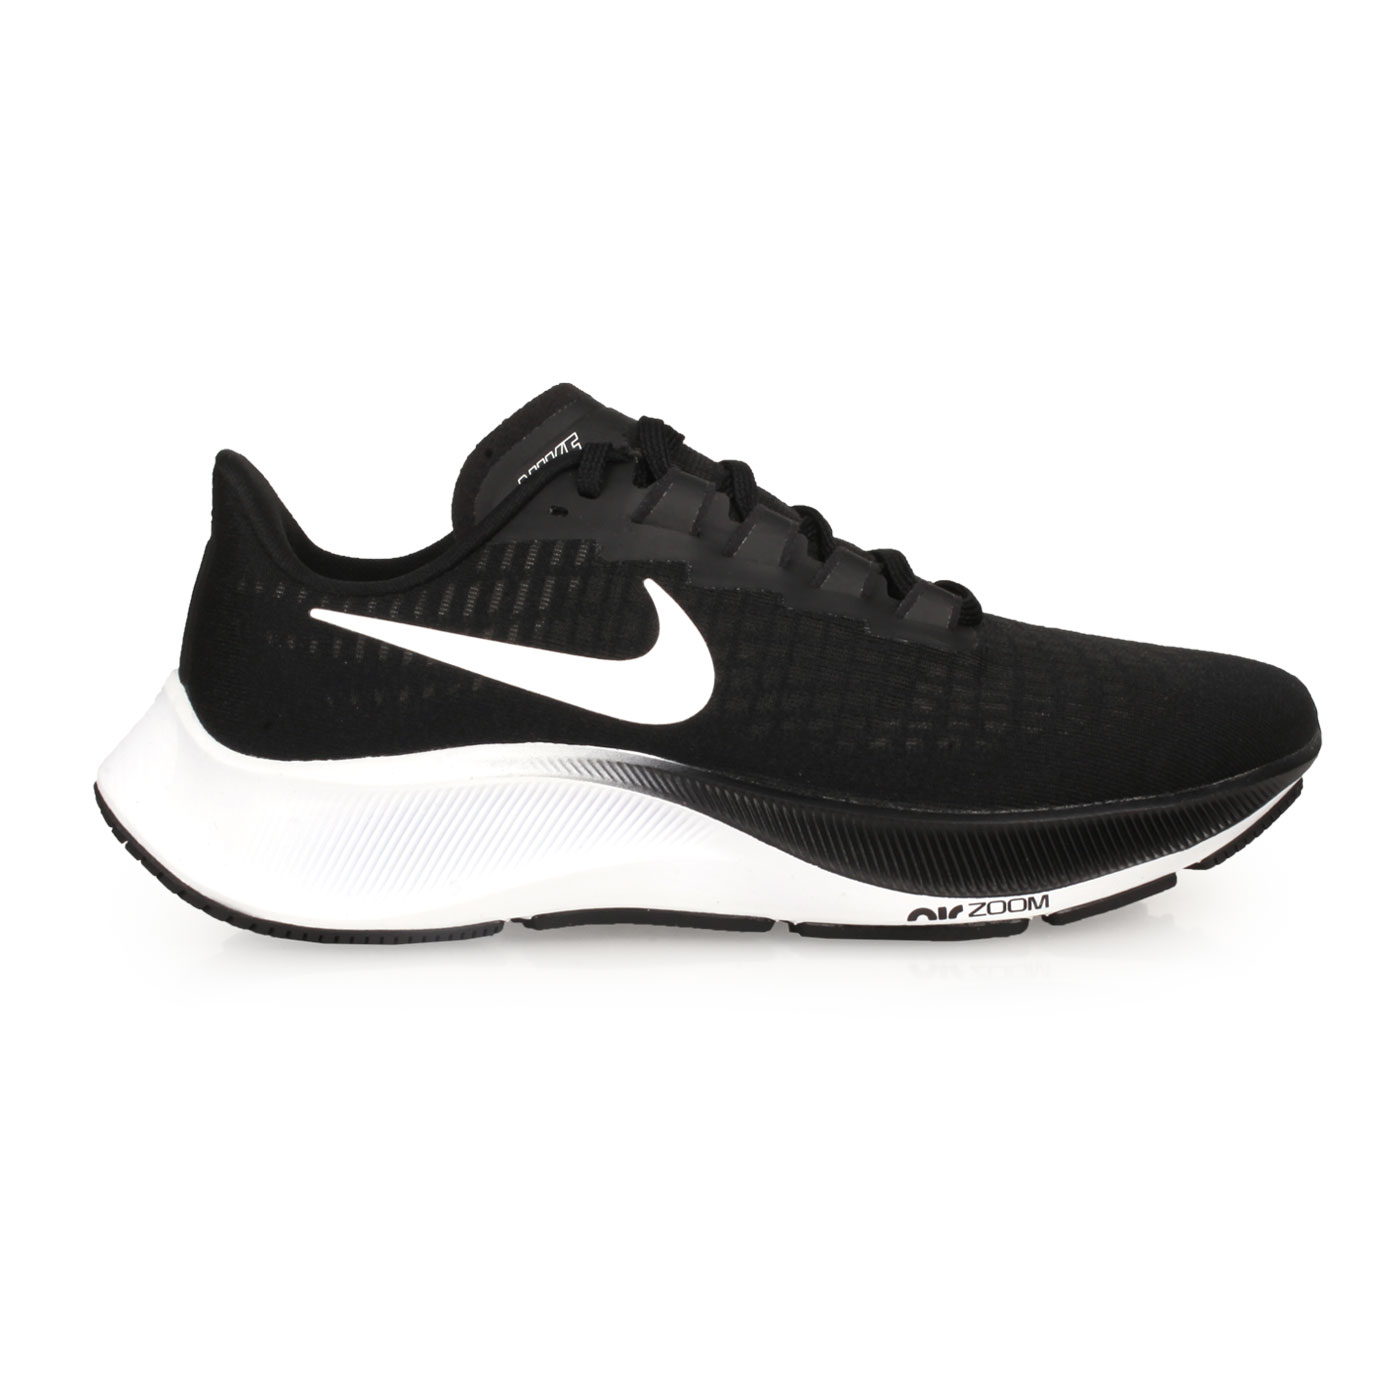 NIKE 女款慢跑鞋  @WMNS AIR ZOOM PEGASUS 37@BQ9647002 - 黑白